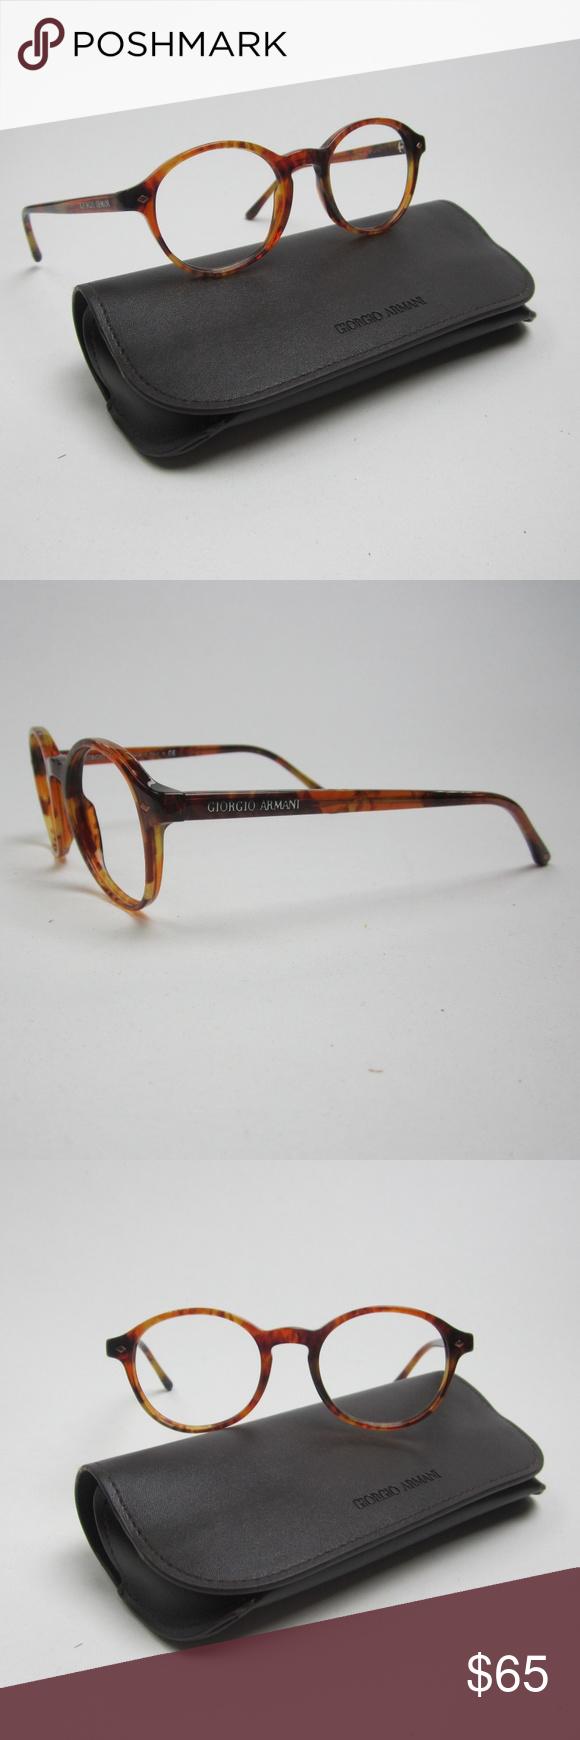 2e0d4209f389 Giorgio Armani AR 7004 Eyeglasses Italy STL218 Giorgio Armani AR 7004 5191  Eyeglasses